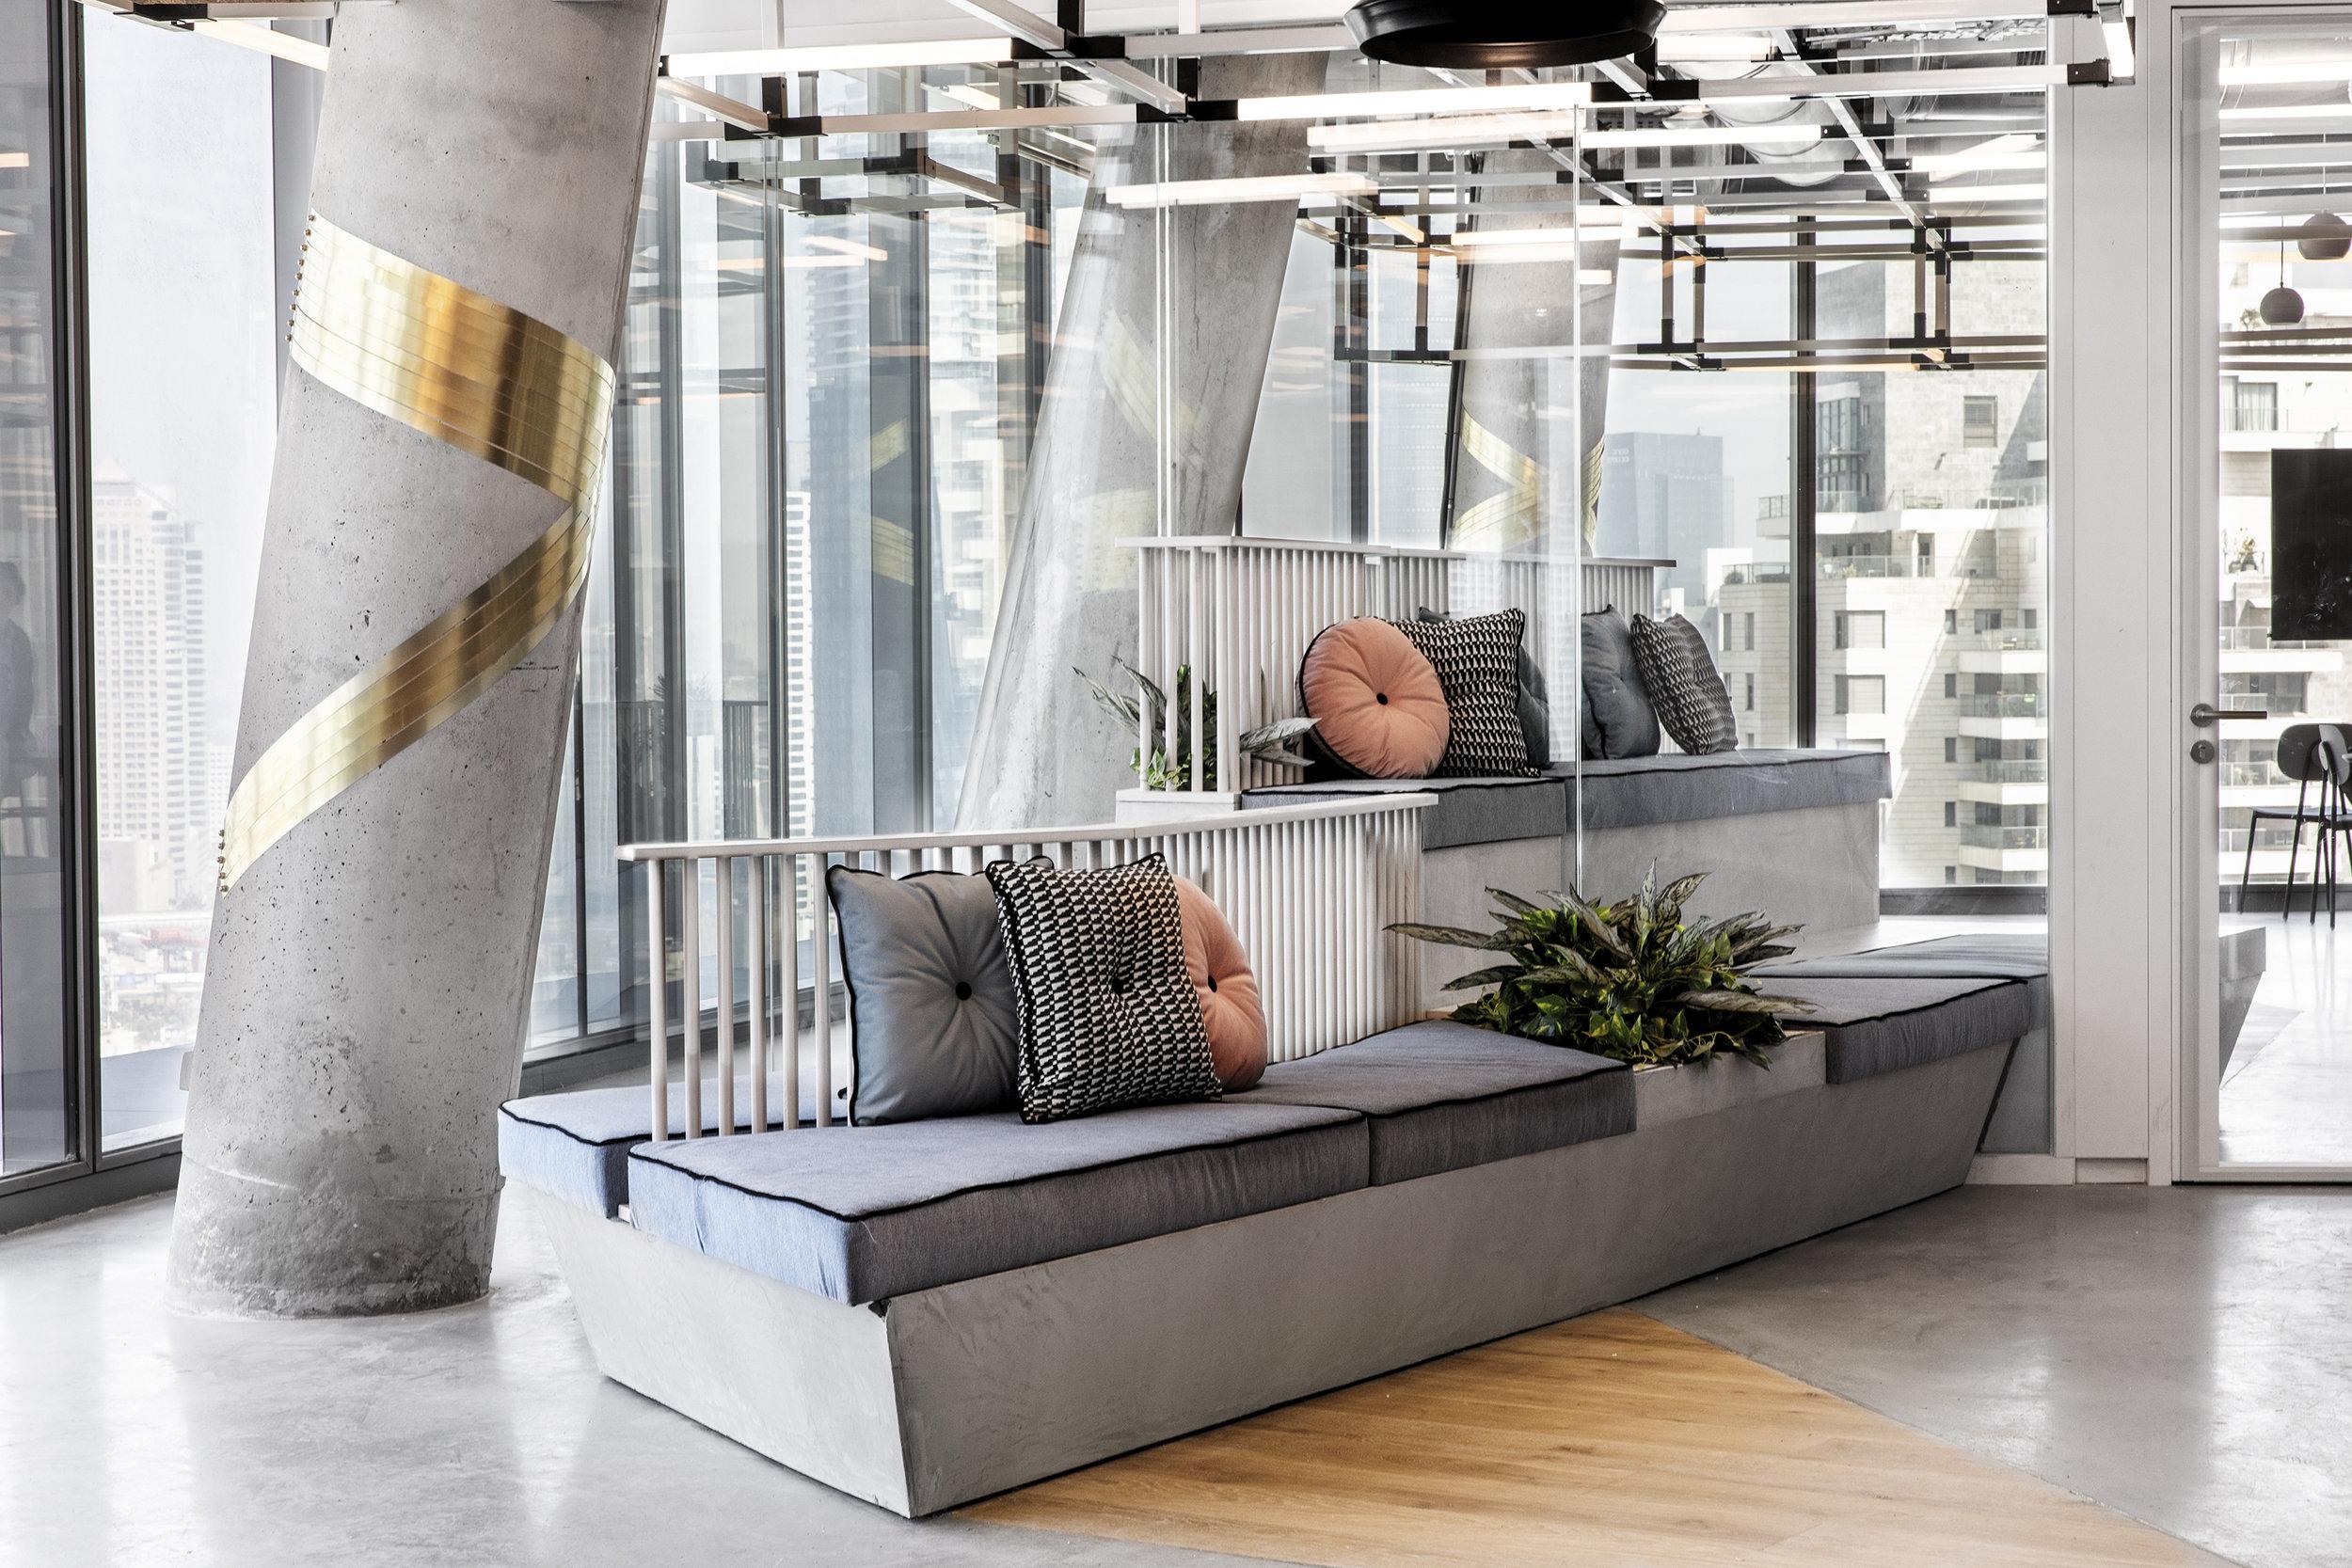 רואי דוד אדריכלות - אדריכל - נטורל אינטליג'נס - ROY DAVID - ARCHITECTURE - ARCHITECT - NI (33).jpg